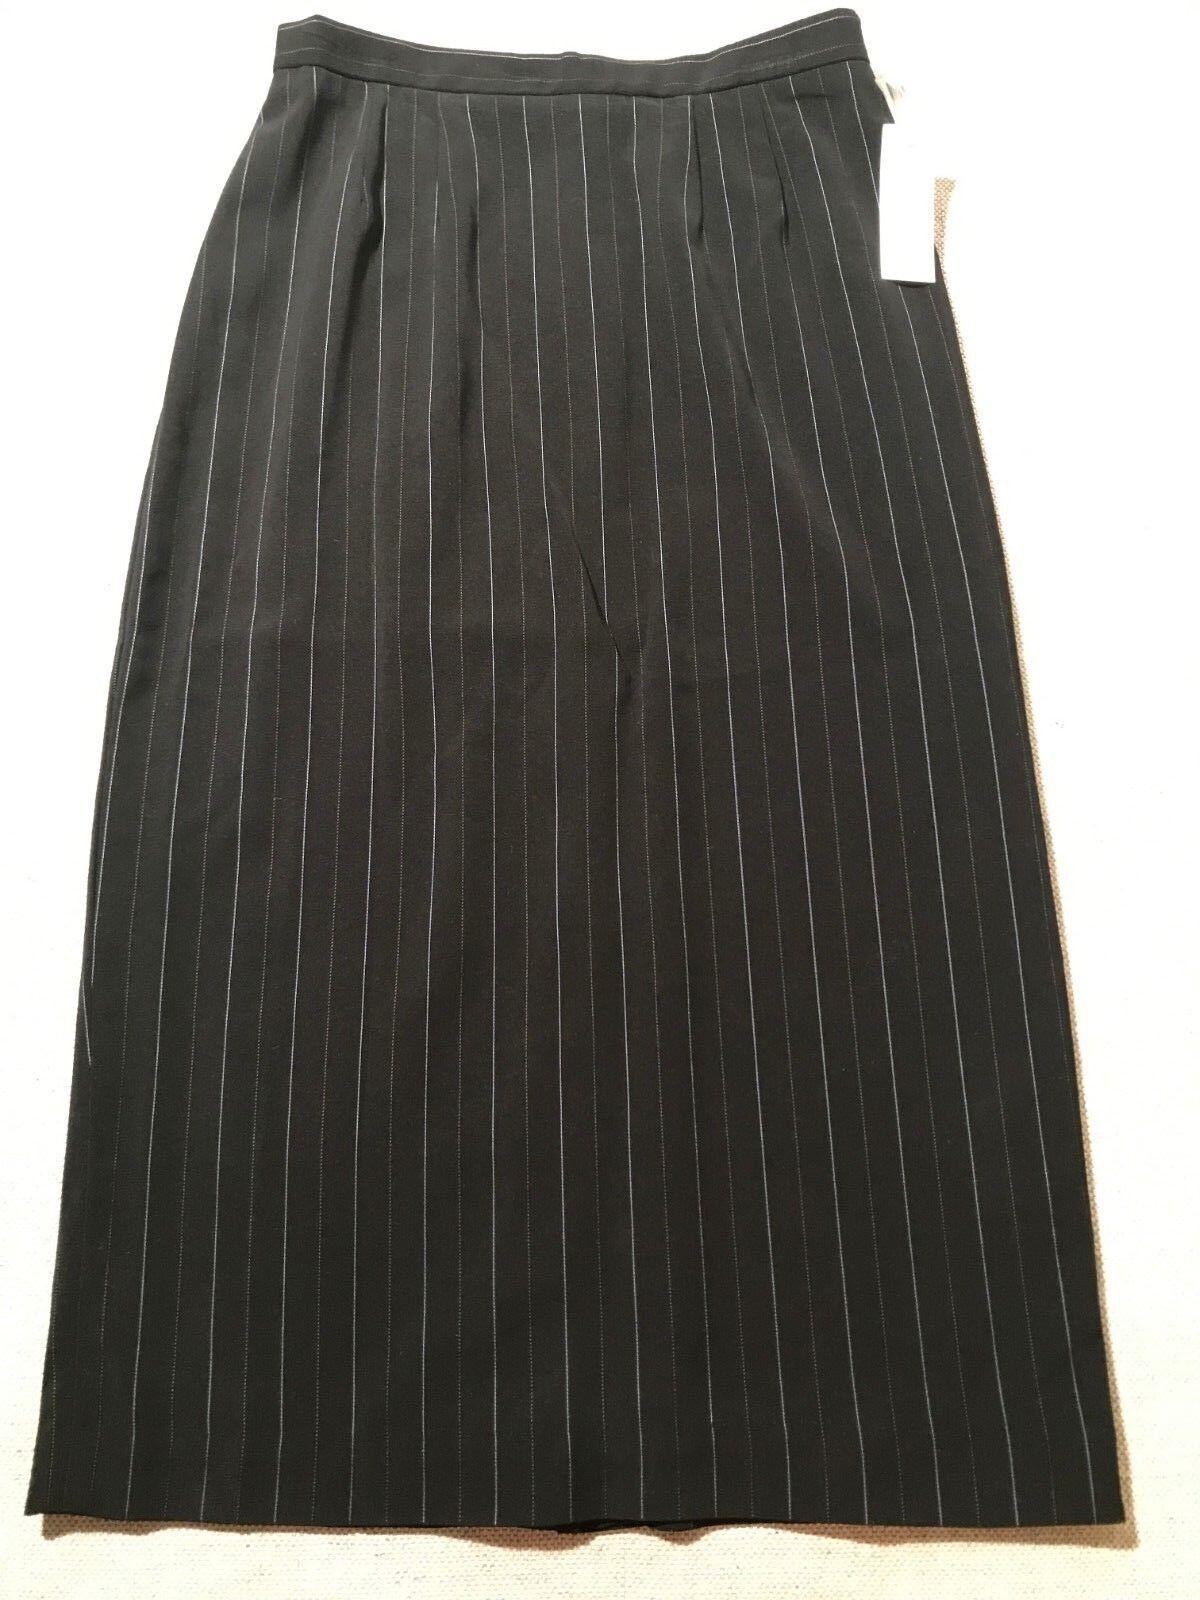 NEW Lily & Taylor Women's Pin Stripe 3 4 Straight Skirt Sz 12  C9